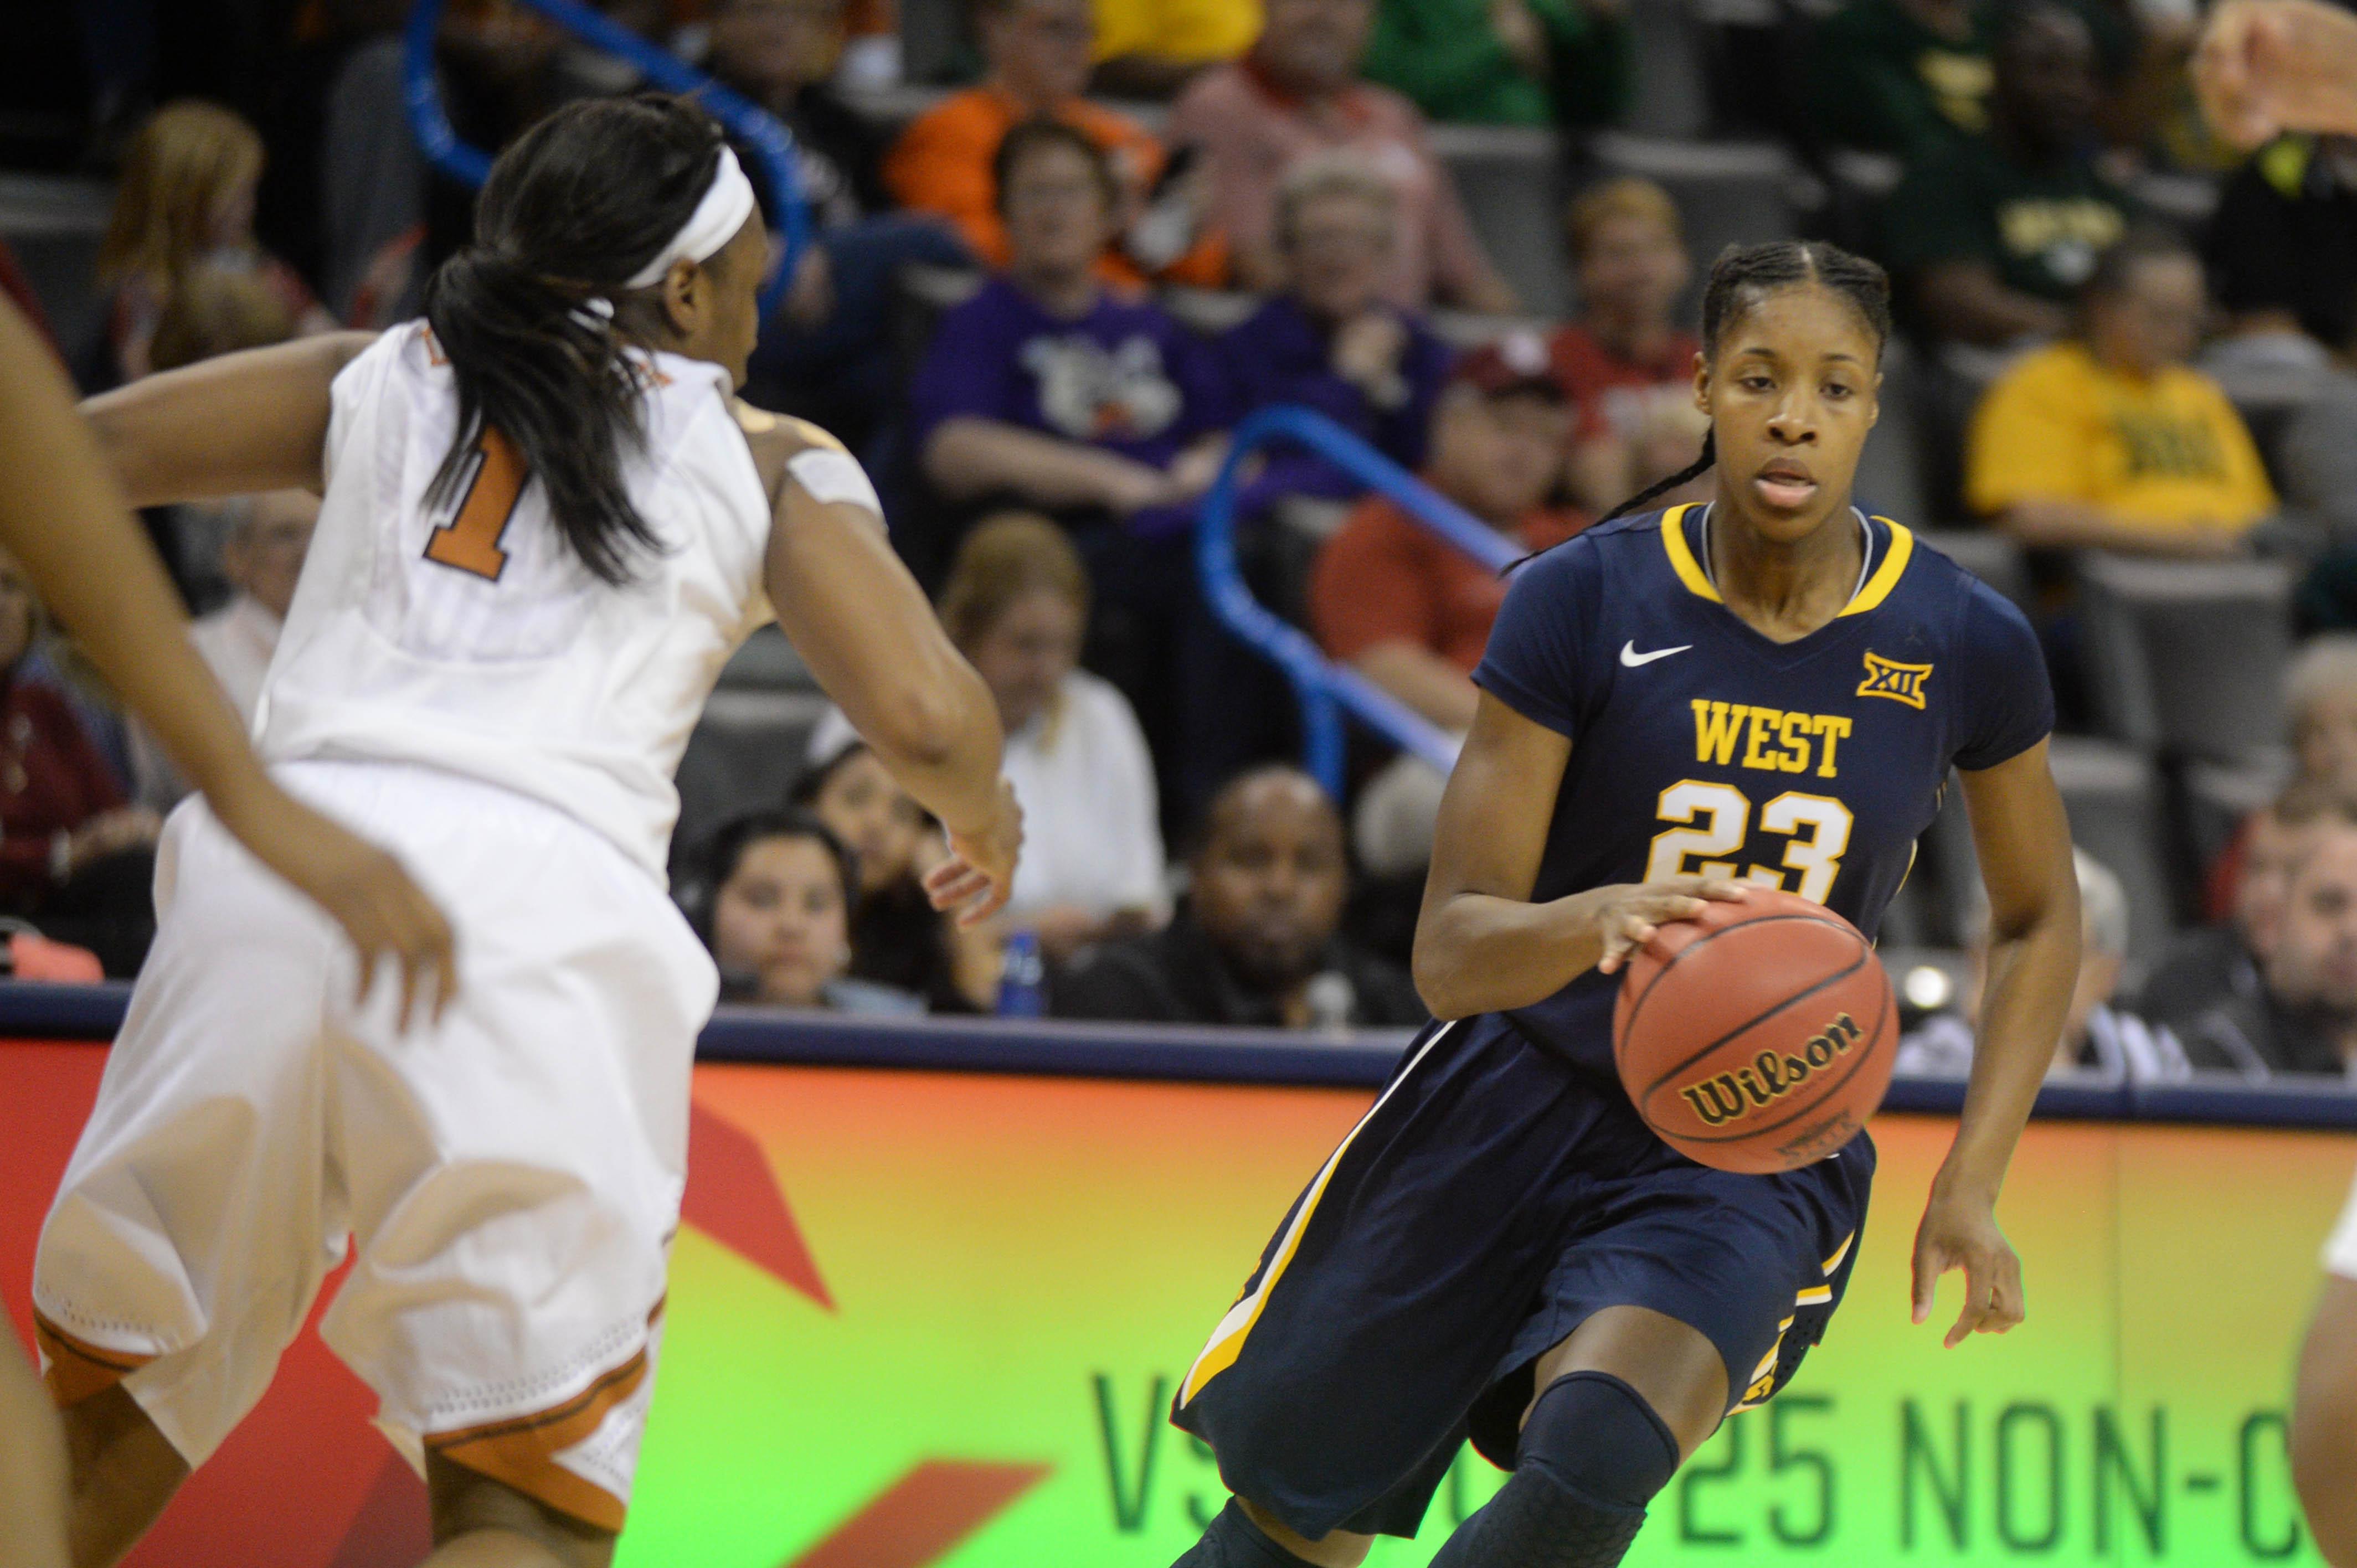 9162531-ncaa-womens-basketball-big-12-conference-tournament-texas-vs-west-virginia